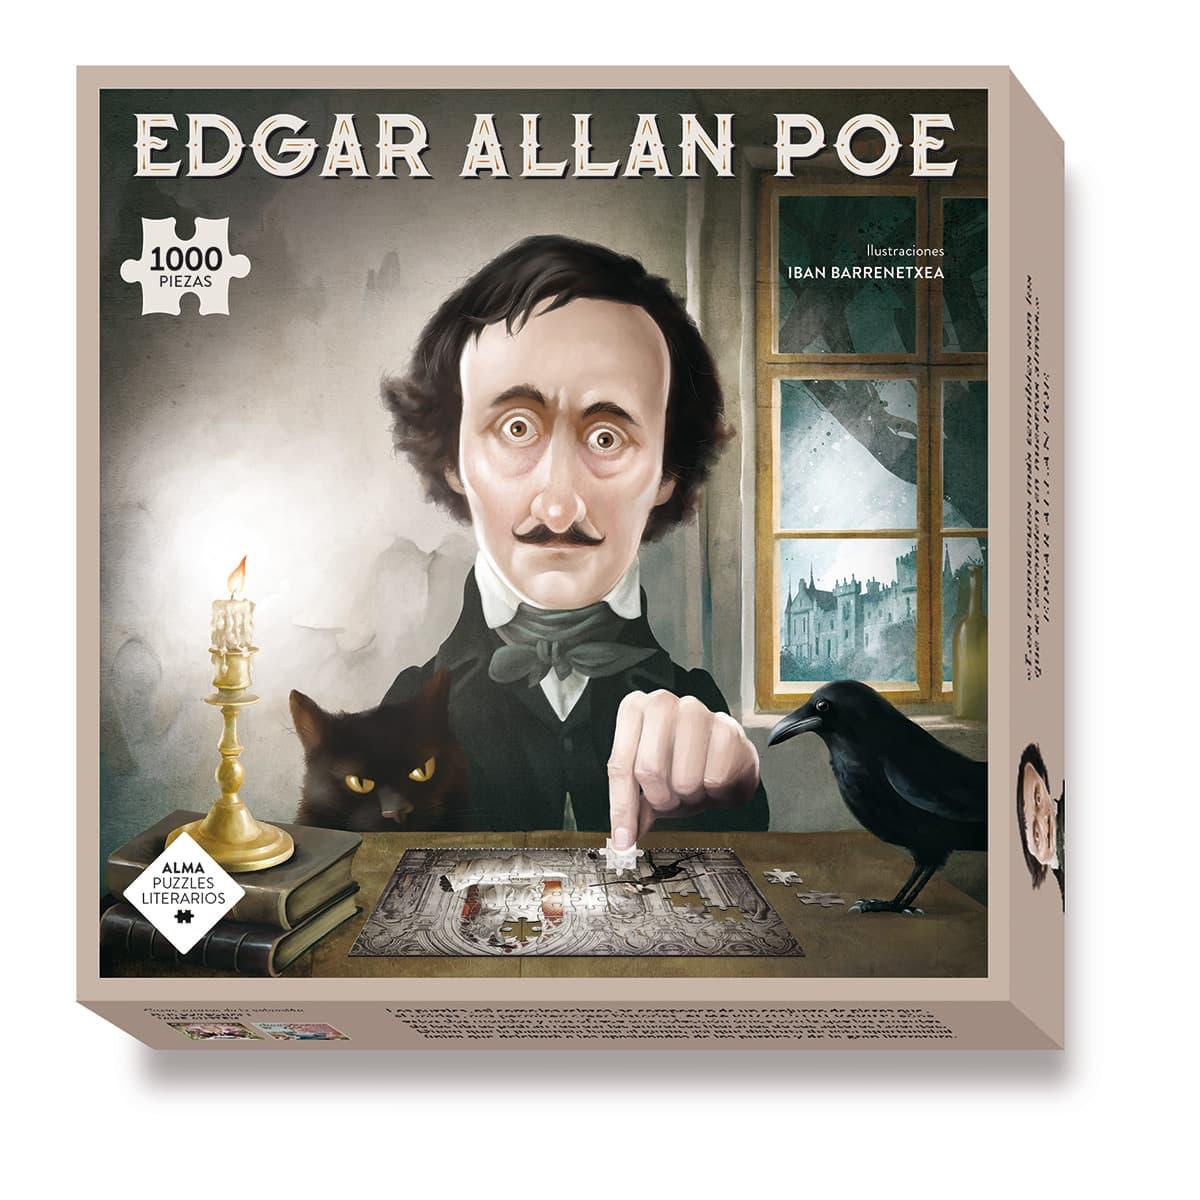 Puzzle Edgar Allan Poe 1000 pcs